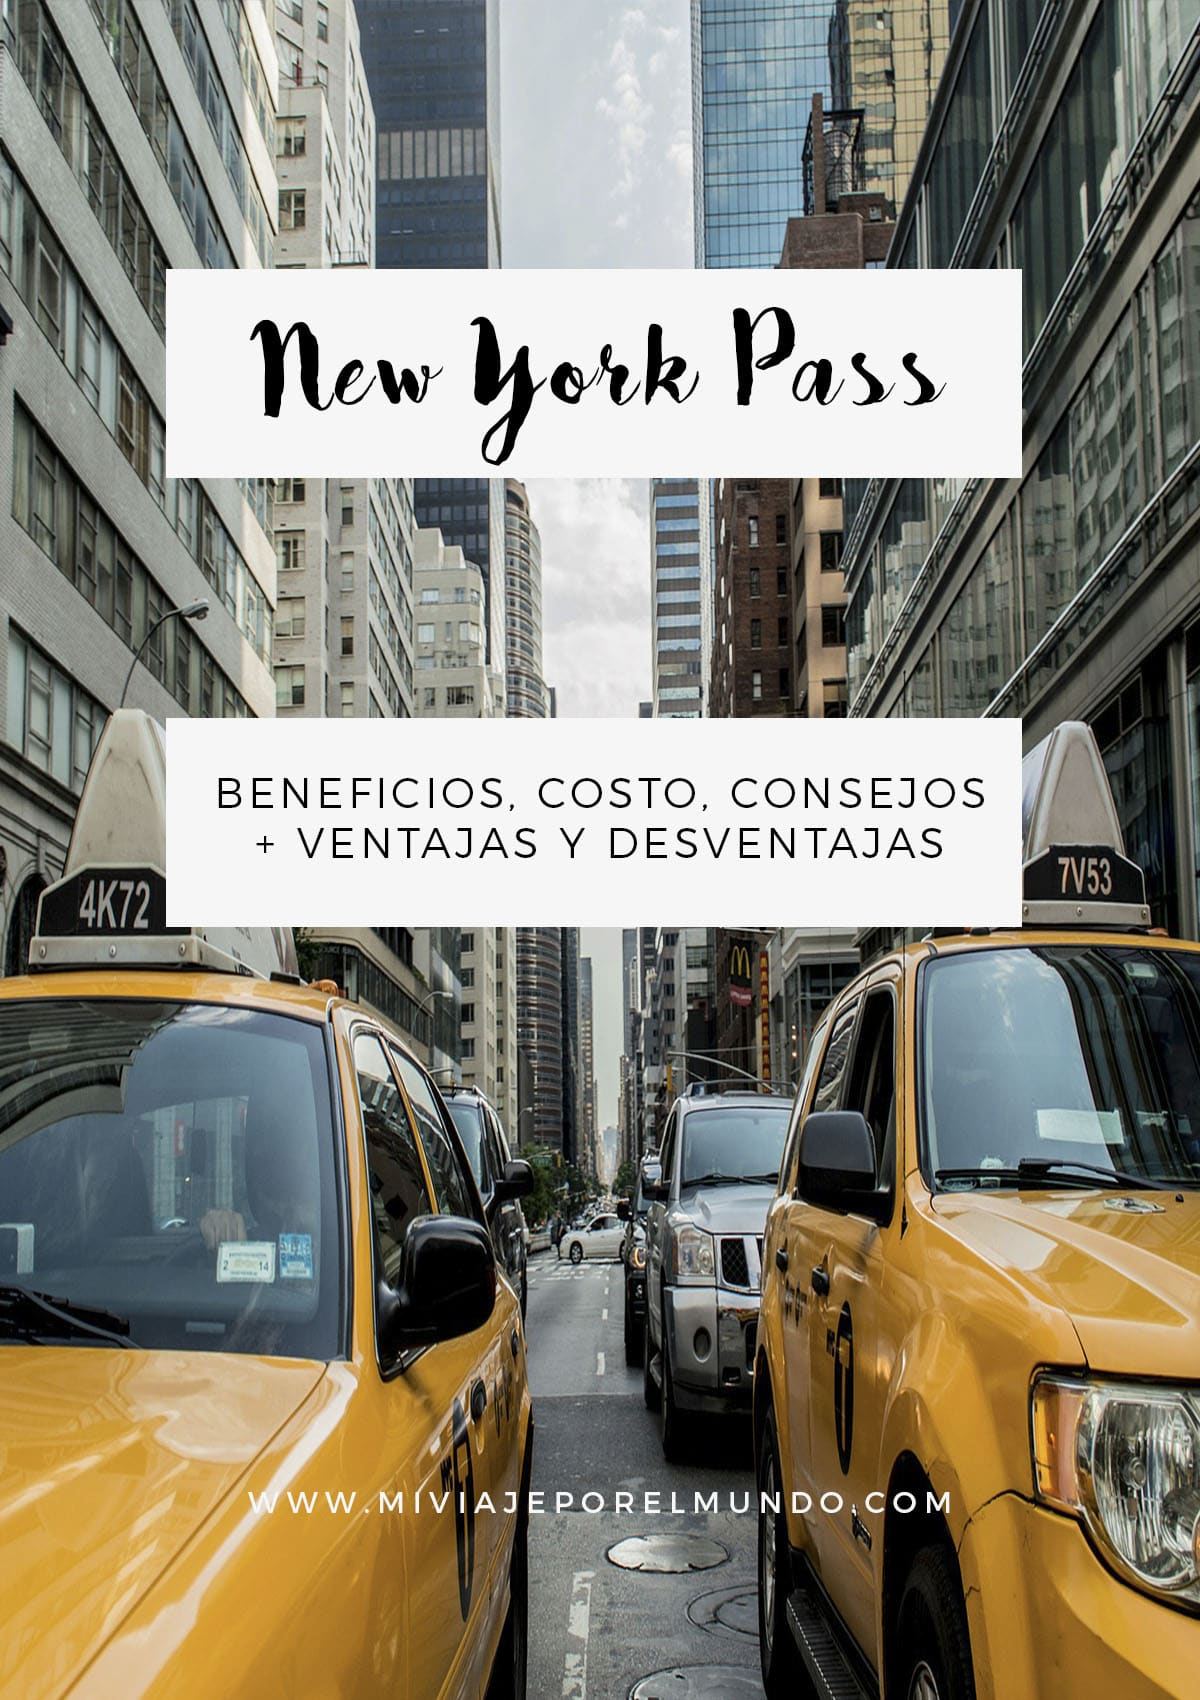 conviene-el-new-york-pass